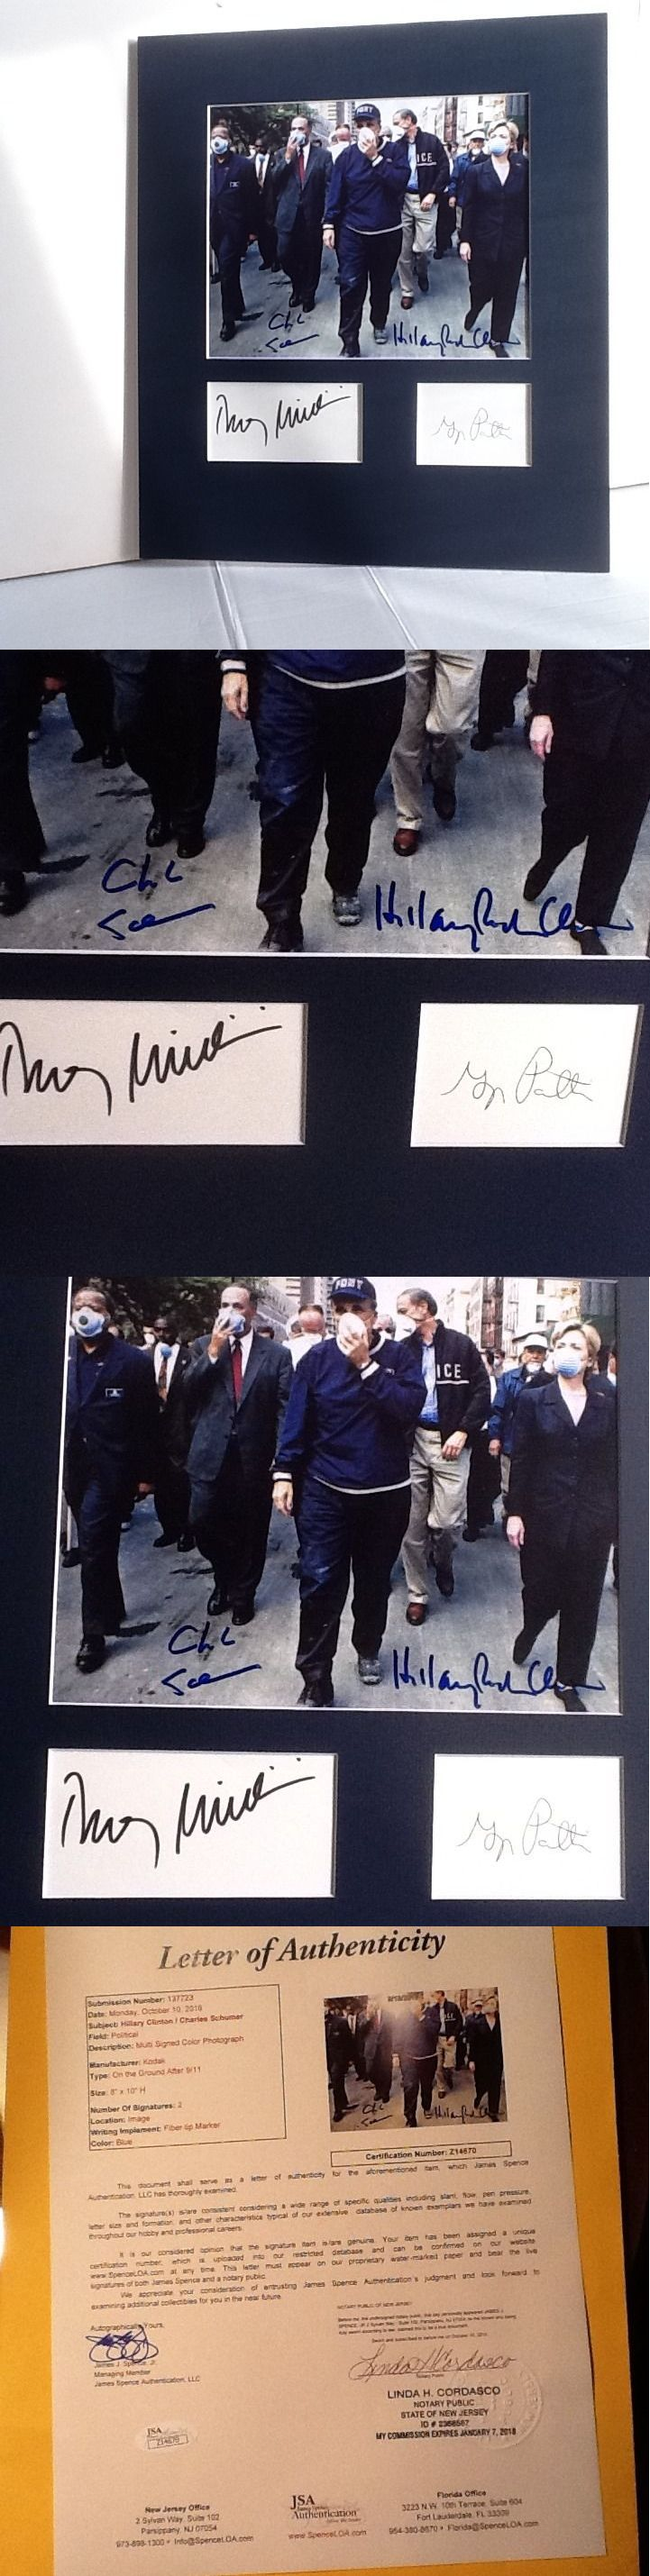 Hillary Clinton: Hillary Clinton Chuck Schumer Signed Autograph 8X10 Photo Rudy Giuliani Jsa Loa BUY IT NOW ONLY: $550.0